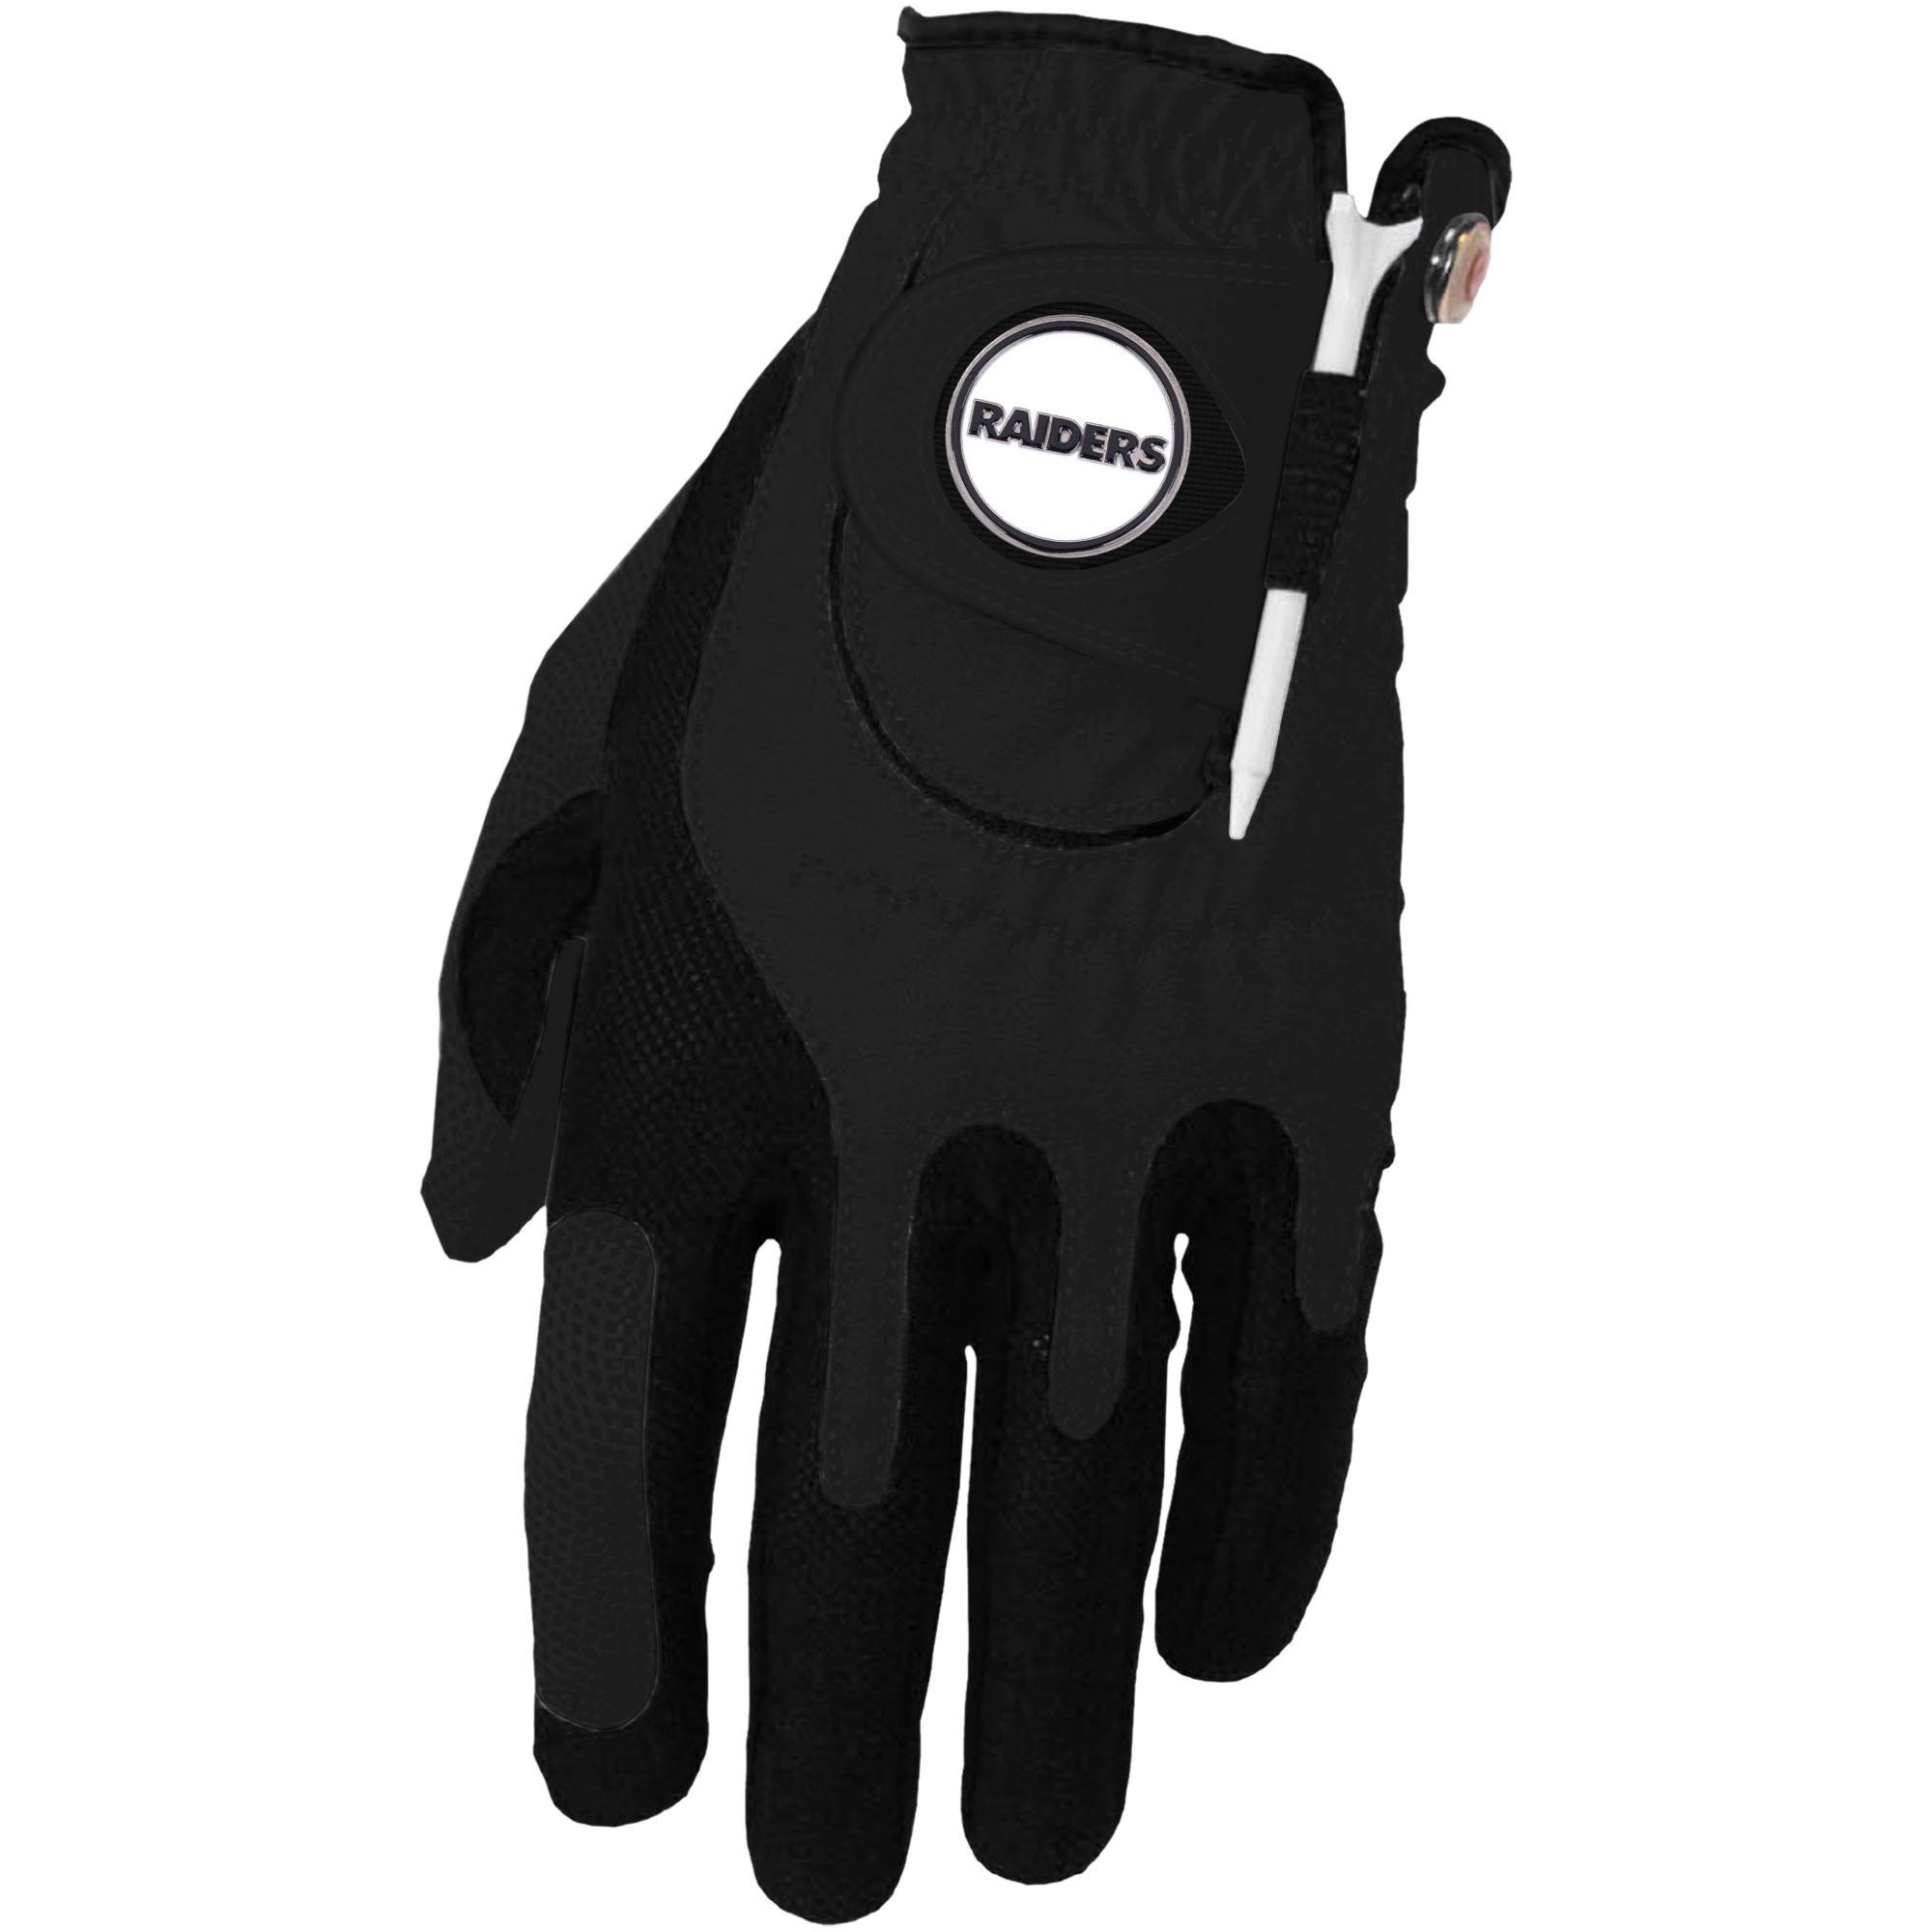 Oakland Raiders Left Hand Golf Glove & Ball Marker Set - Black - OSFM